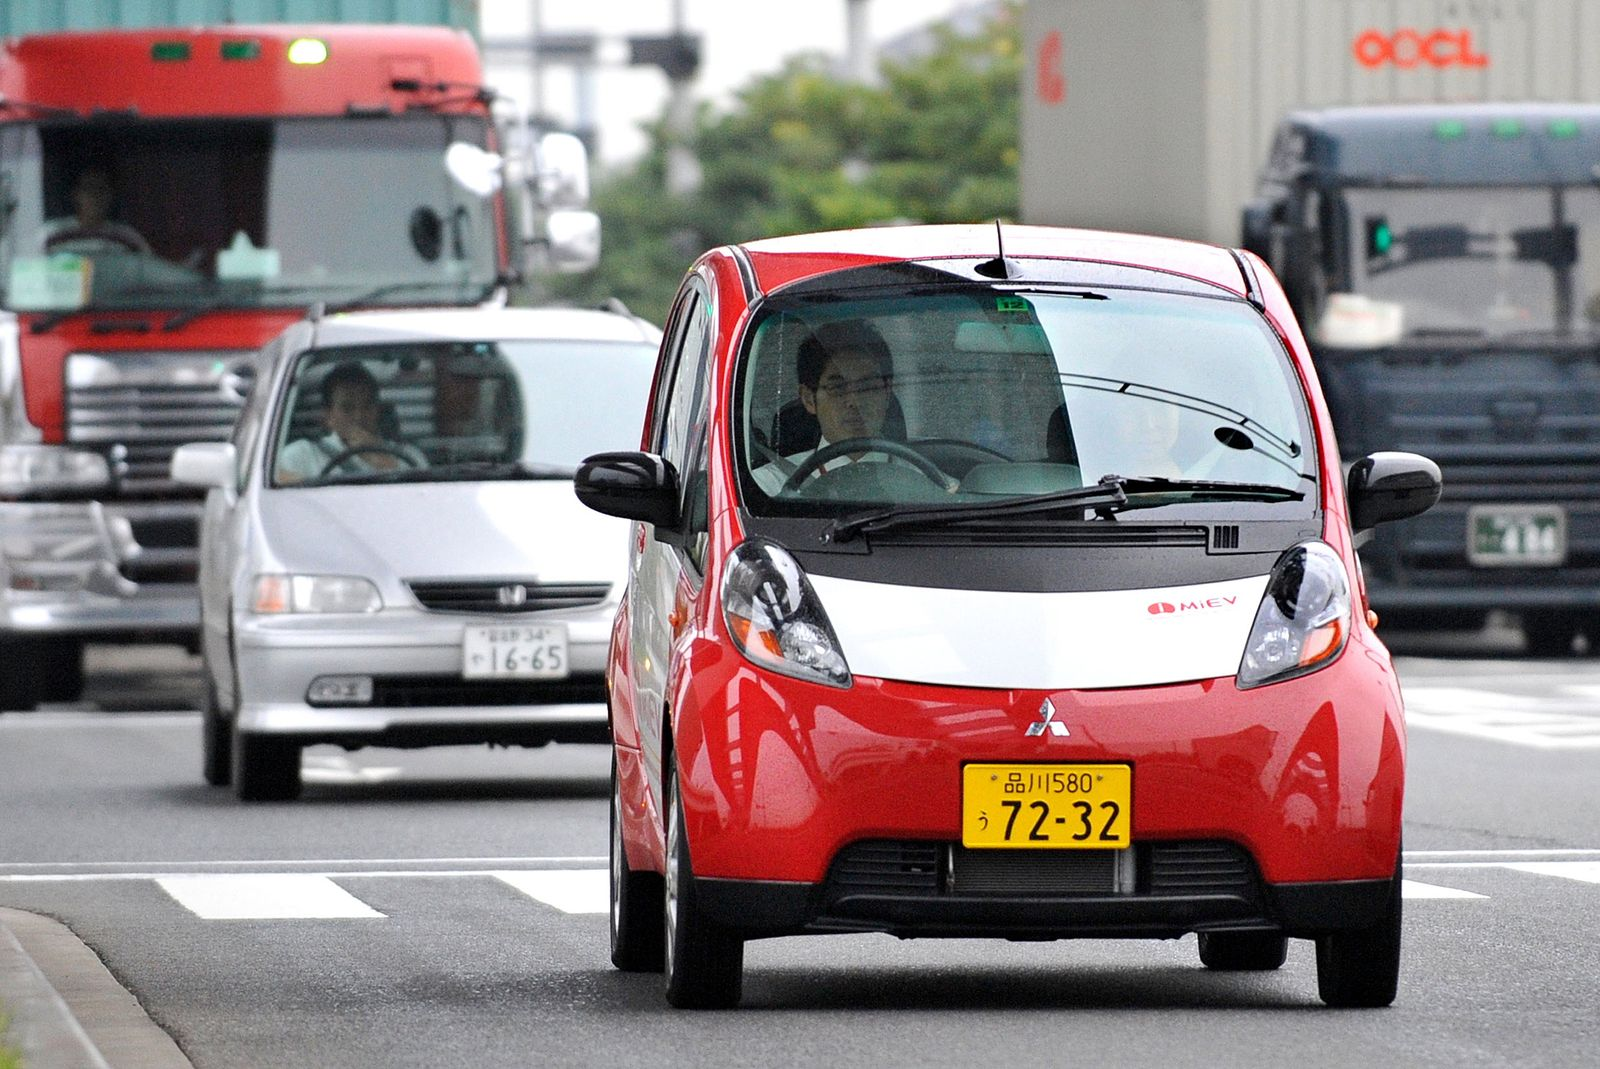 JAPAN-AUTO-ENVIRONMENT-EMISSIONS